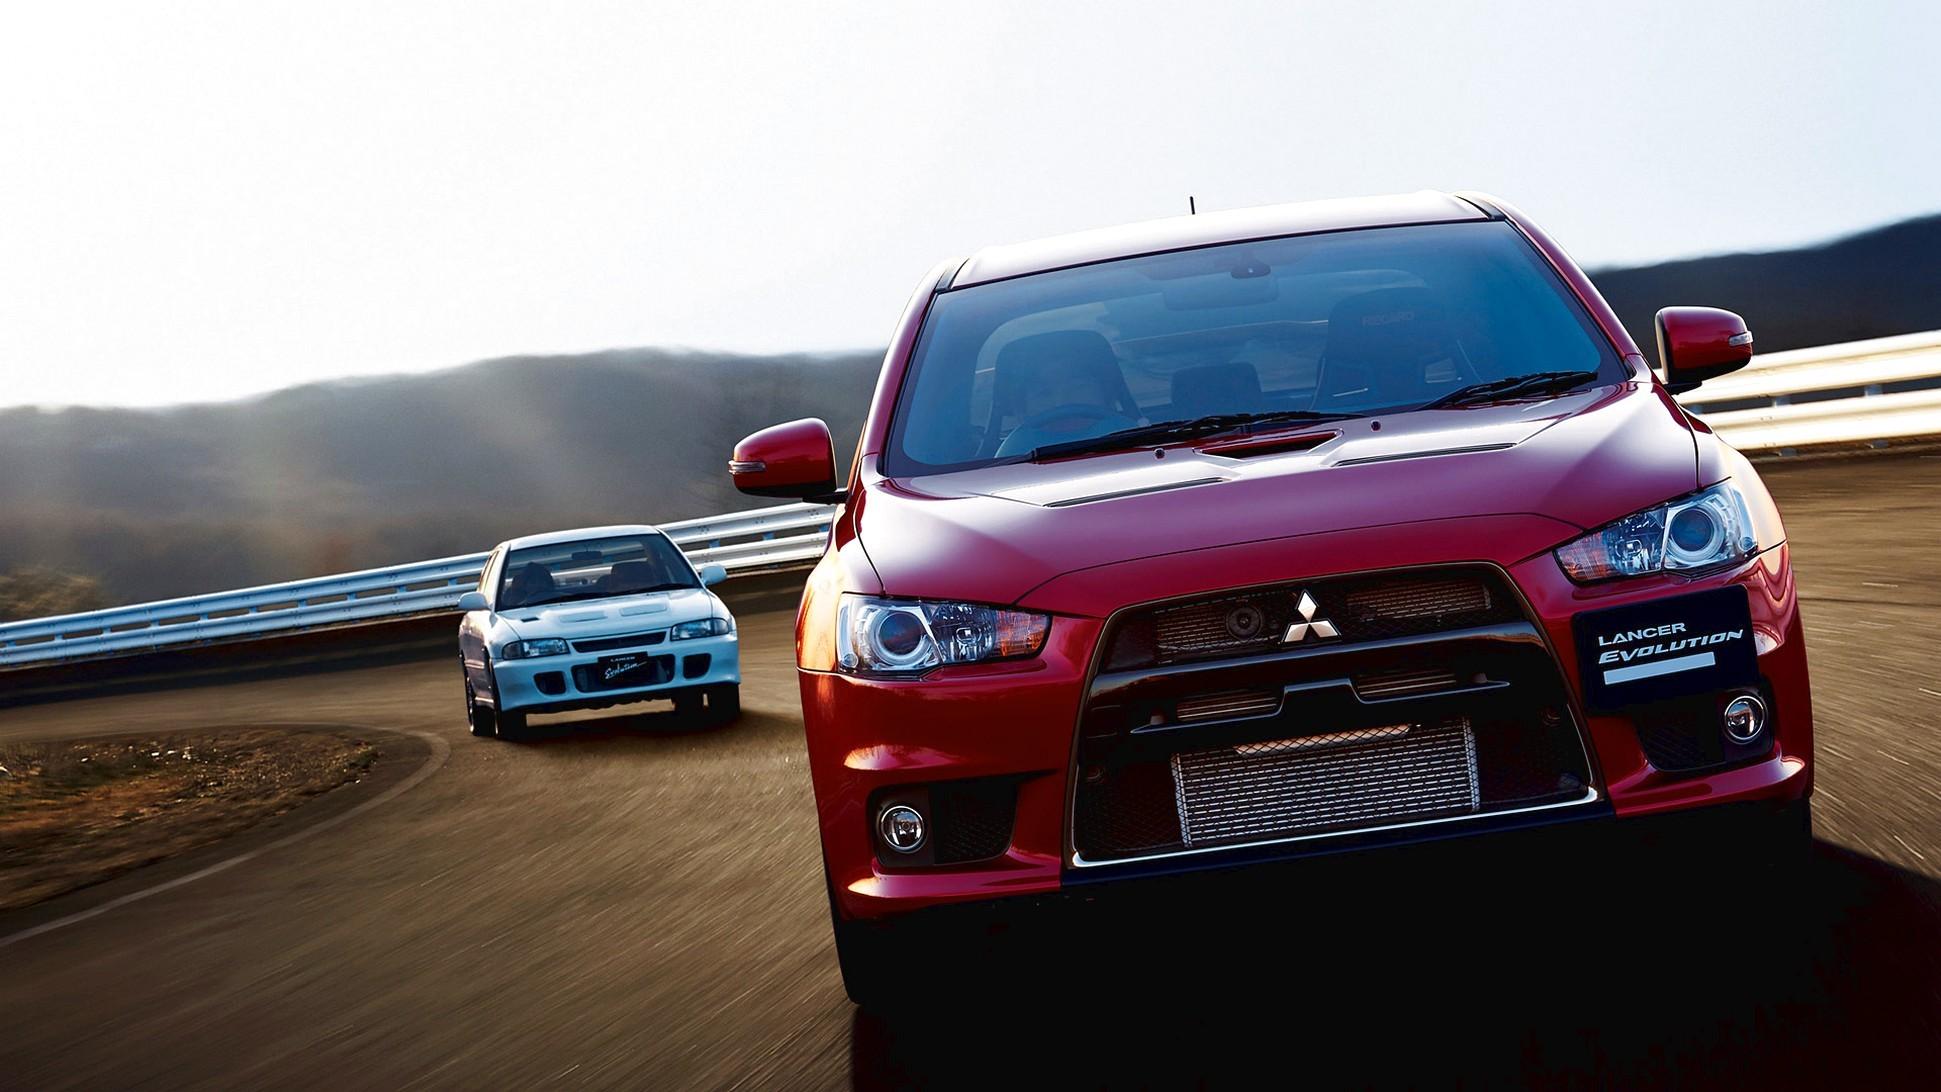 Mitsubishi Lancer Evolution Wallpaper 74 Pictures